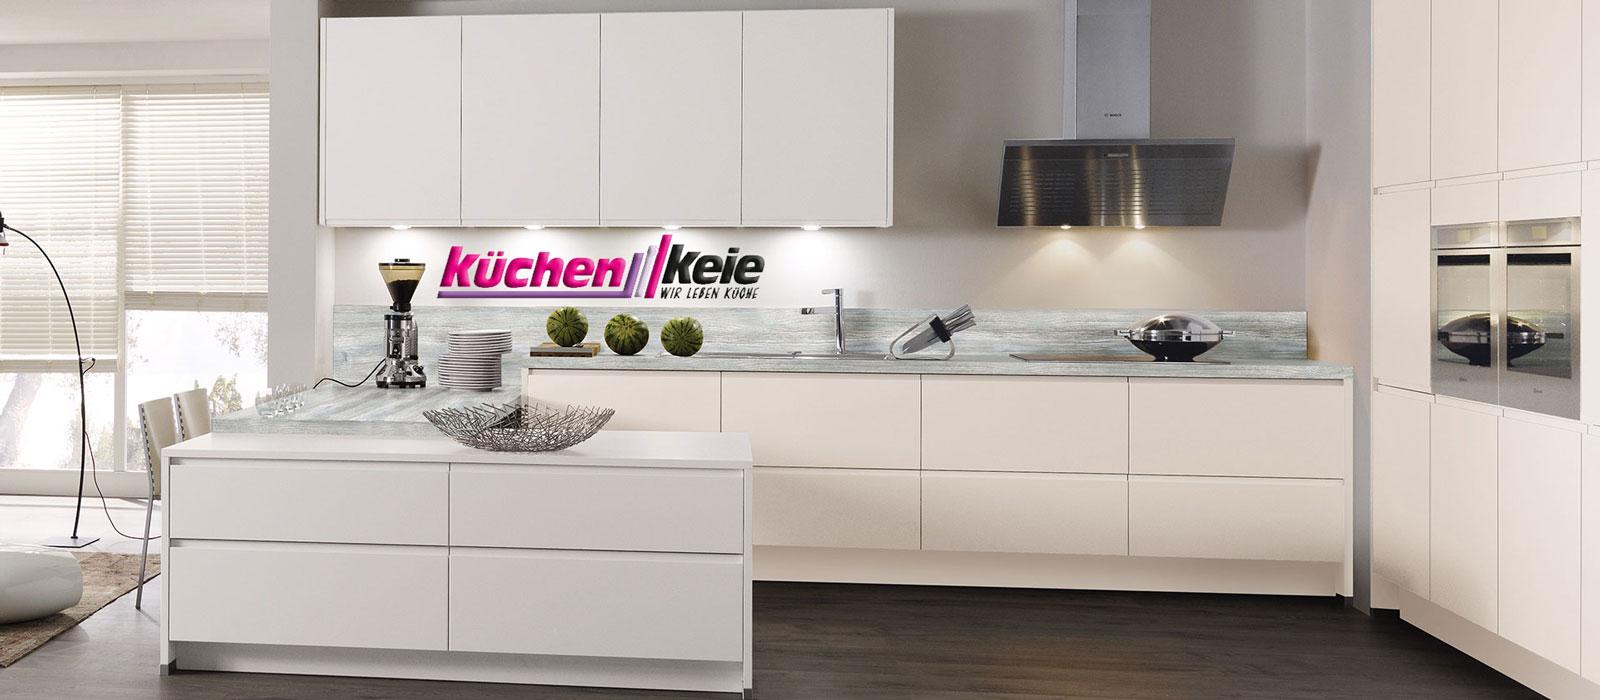 kuechenguide.com-kuechen-keie-Hofheim-banner